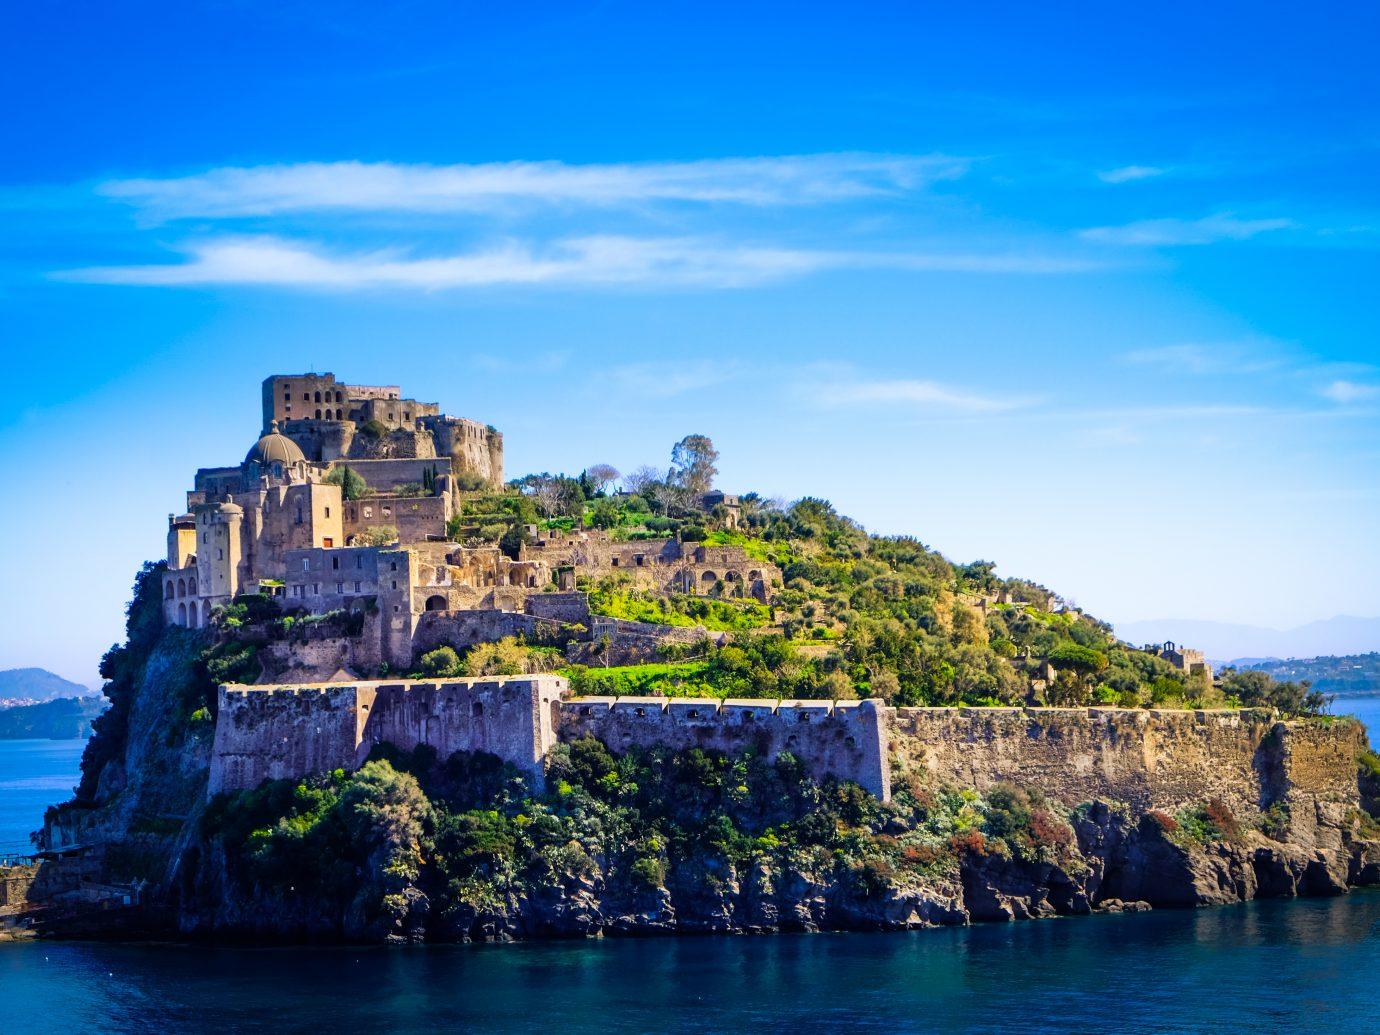 The aragonese castle in the island of ischia